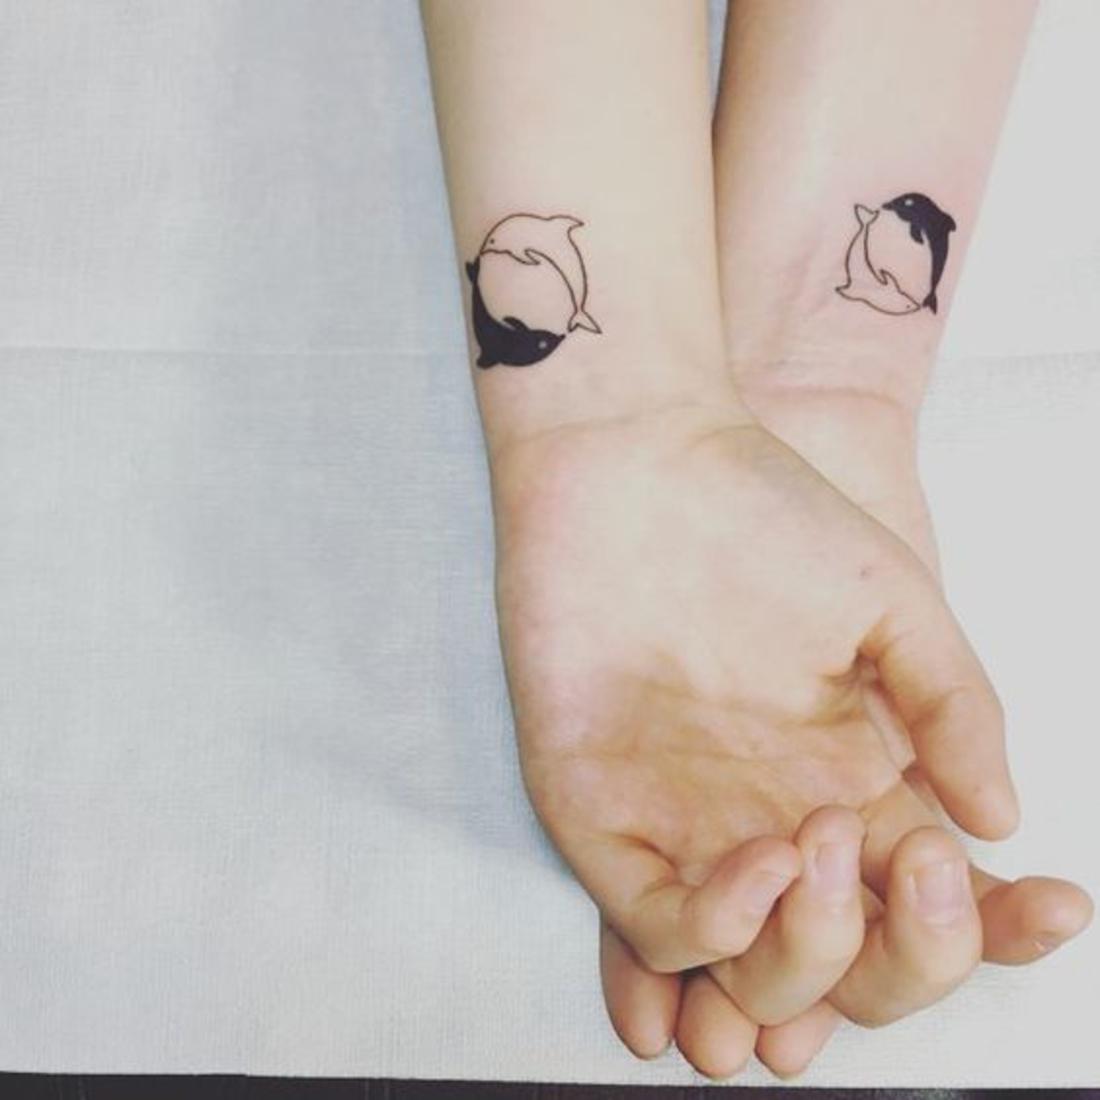 tatuajes en pareja, delfines negro y blanco, tatuajes en las muñecas, romántico, interesante